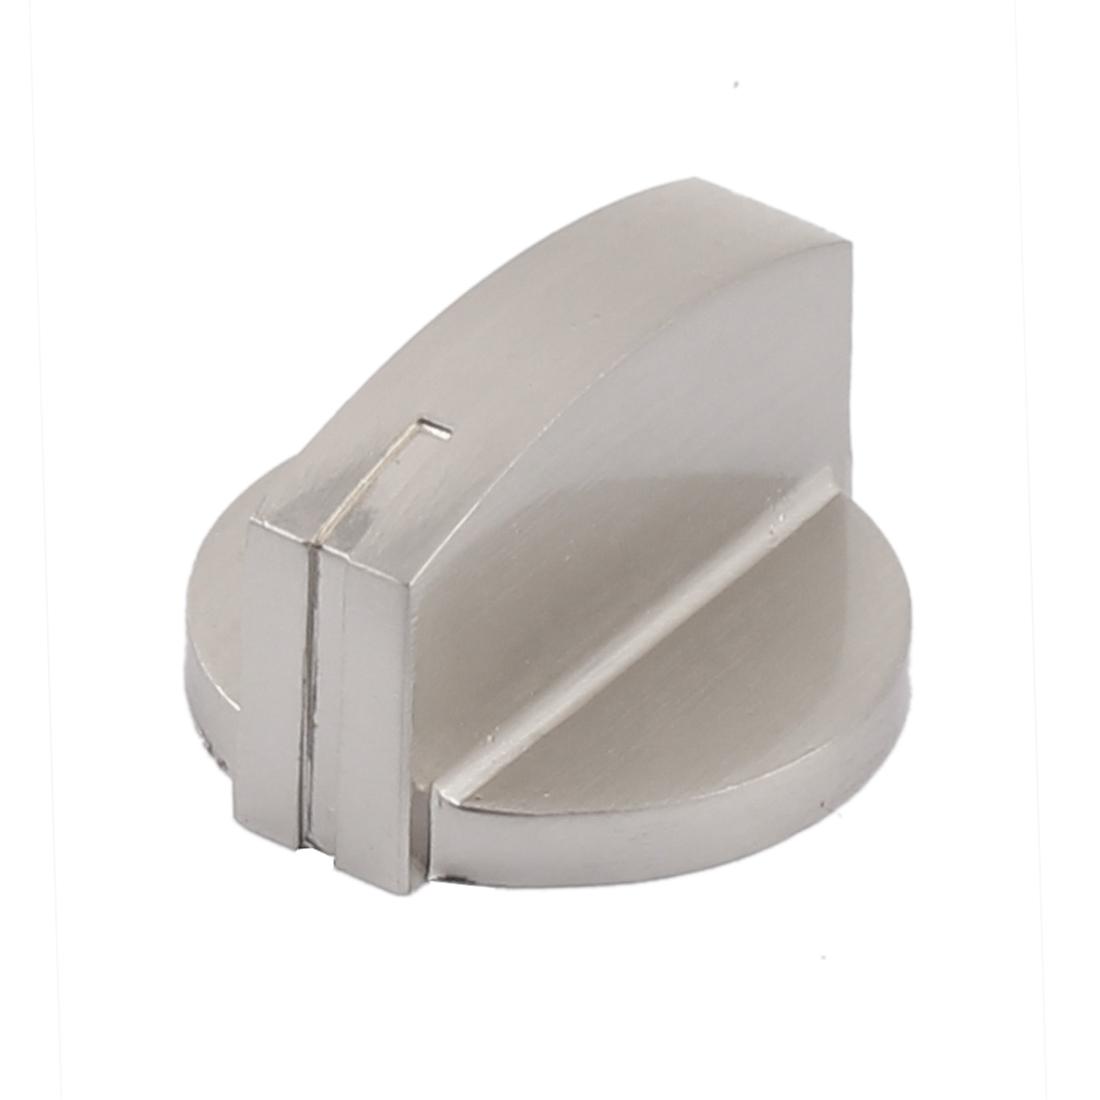 Kitchenware Gas Stove Oven Alloy Rotary Controller Switch Range Knob 3.8cm Dia